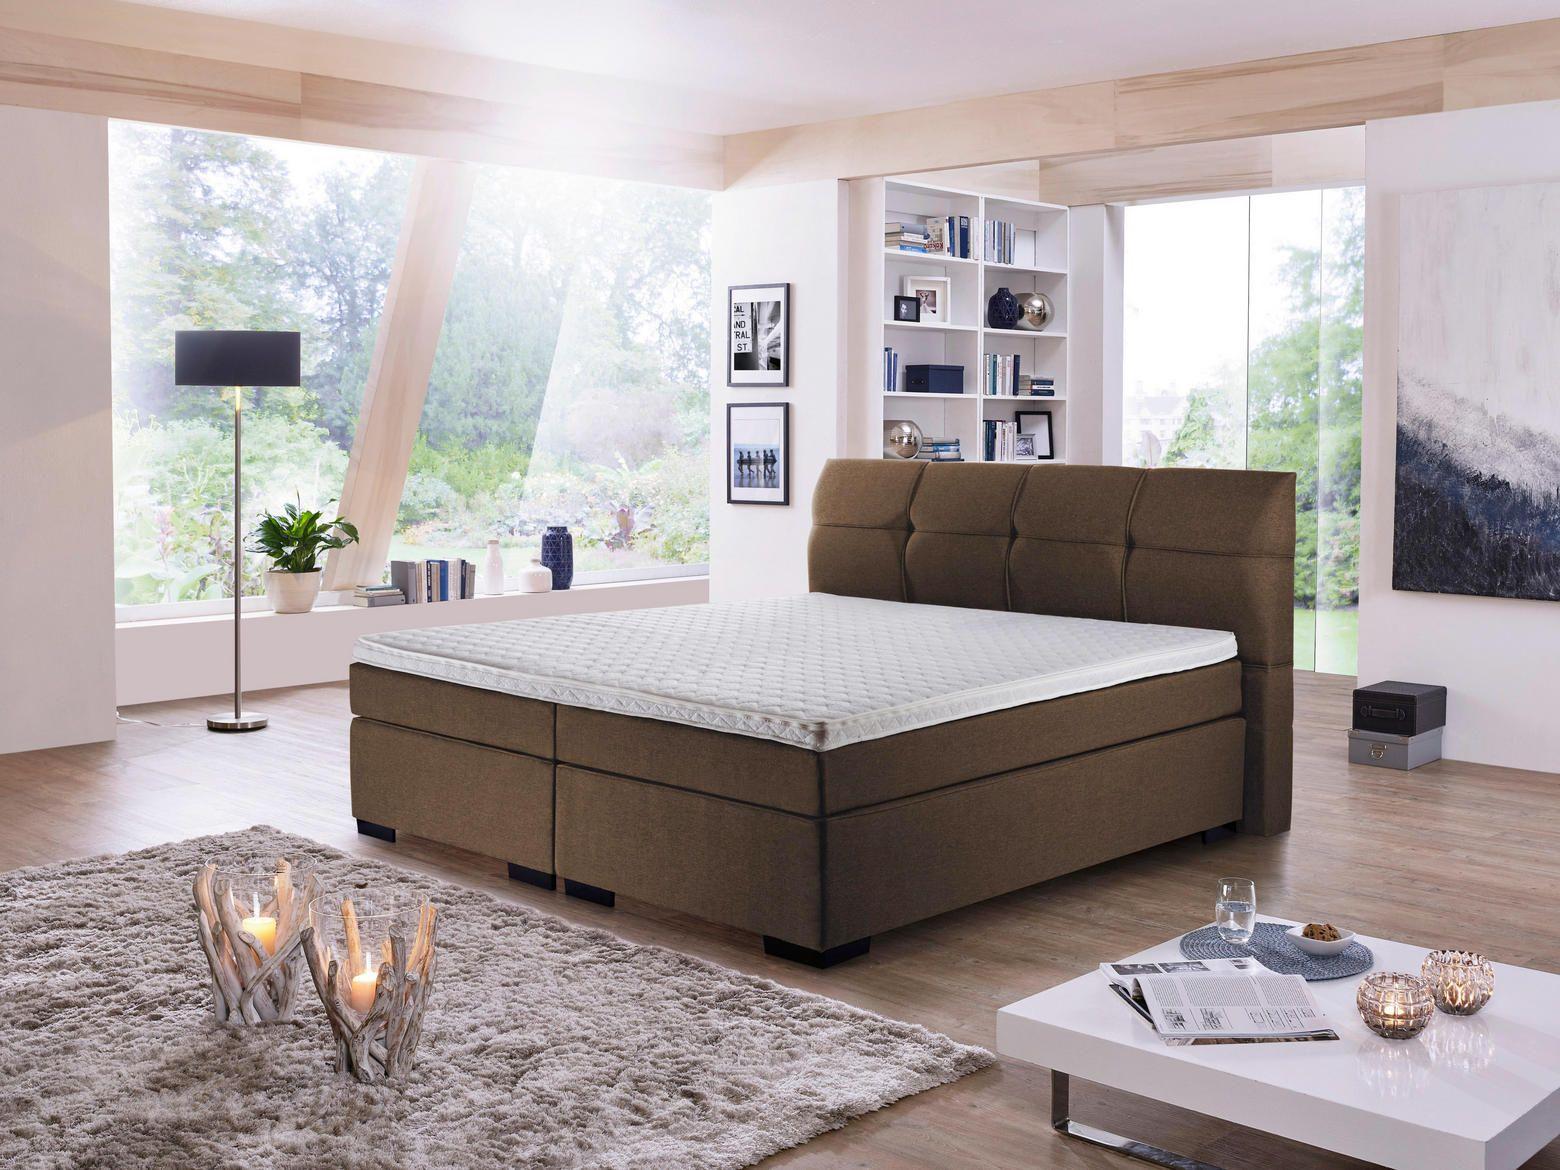 Boxspringbett 160x200 Textil Dunkelbraun Double Bed Designs Bed